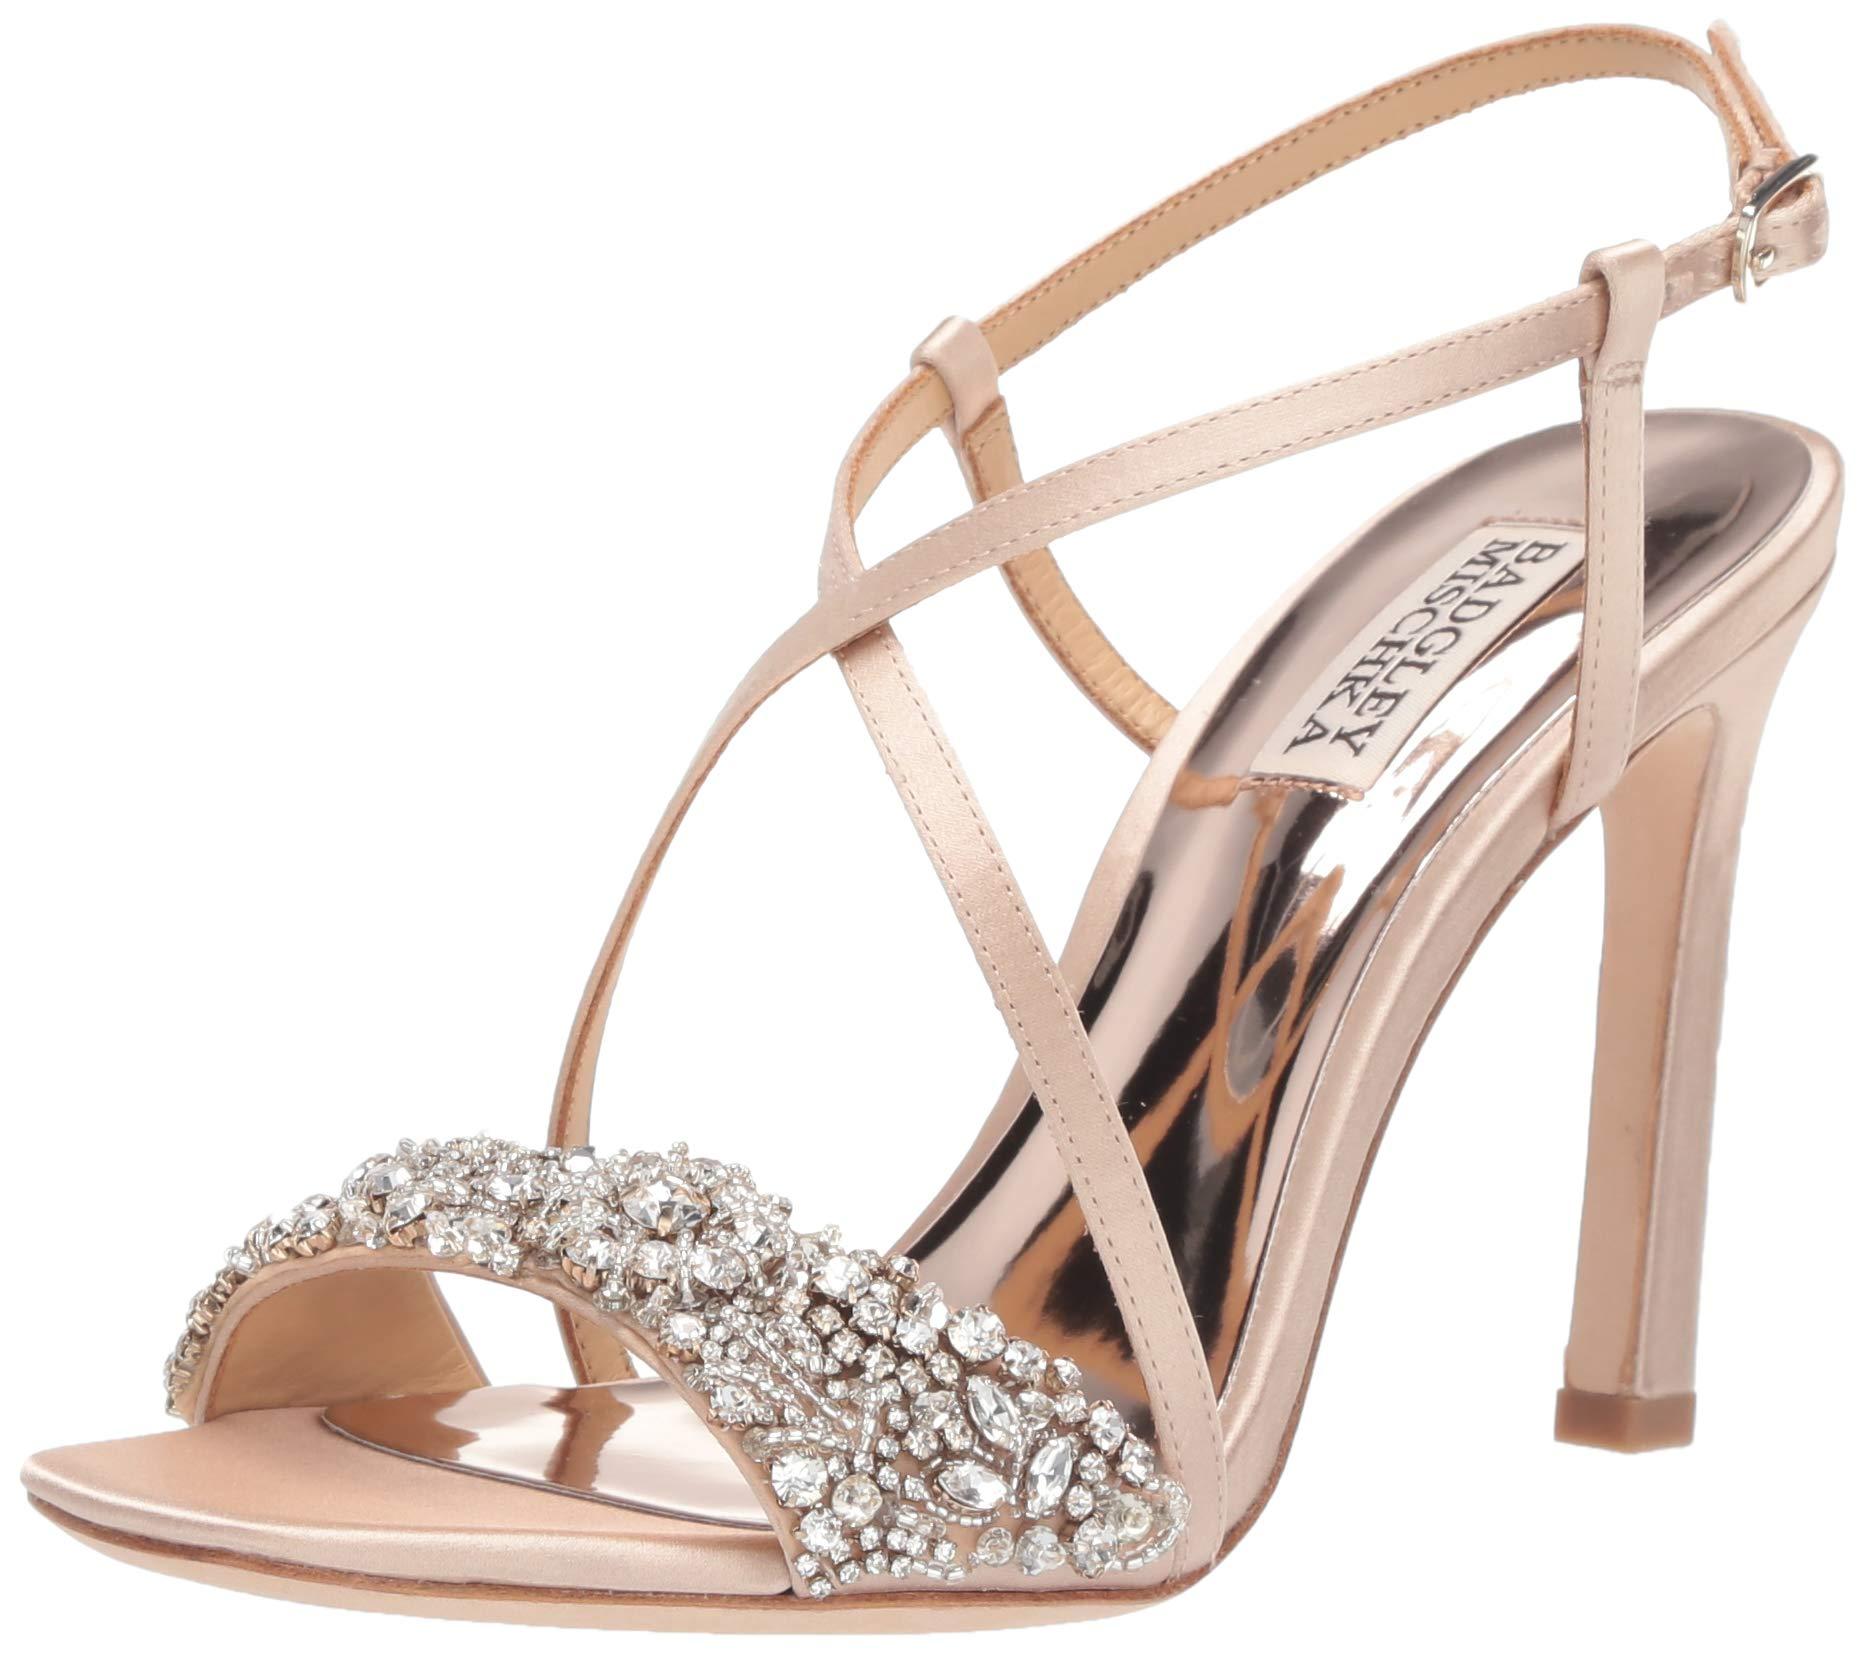 Badgley Mischka Womens Elana Heeled Sandal